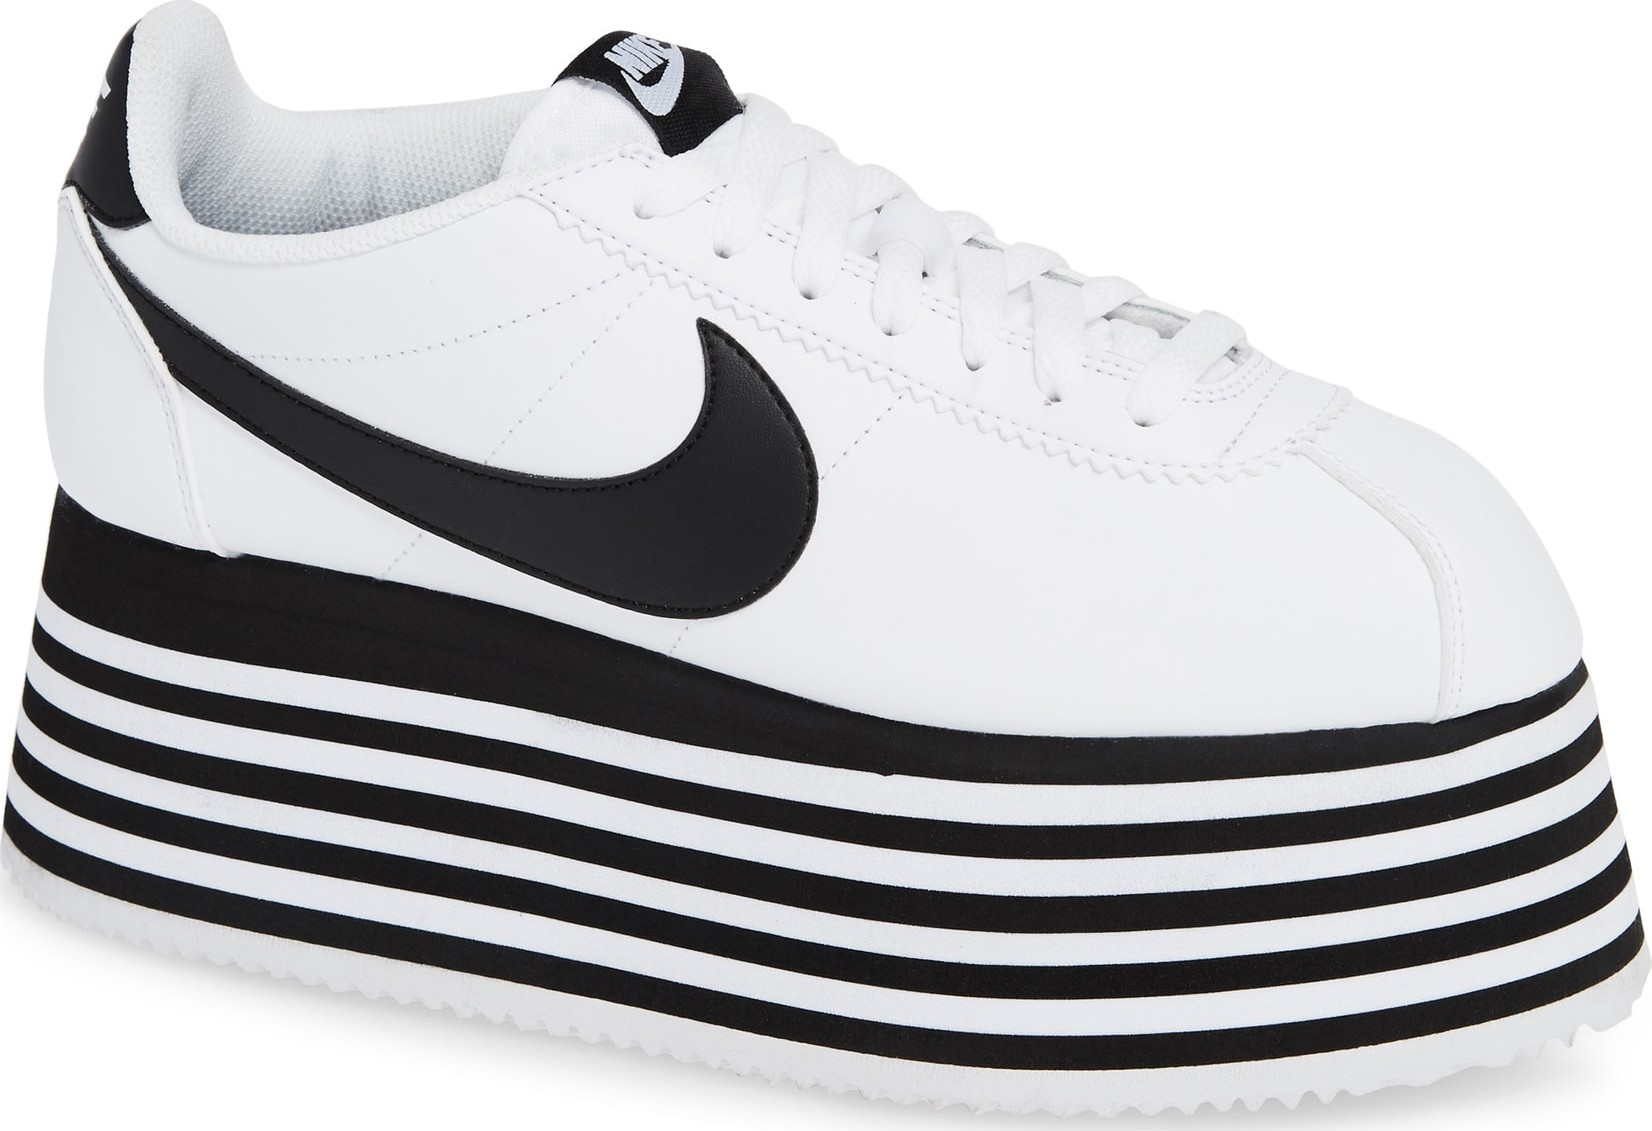 cheap for discount bb22a 86ff7 Comme Des Garcons x Nike Cortez Platform Sneaker - Mkt